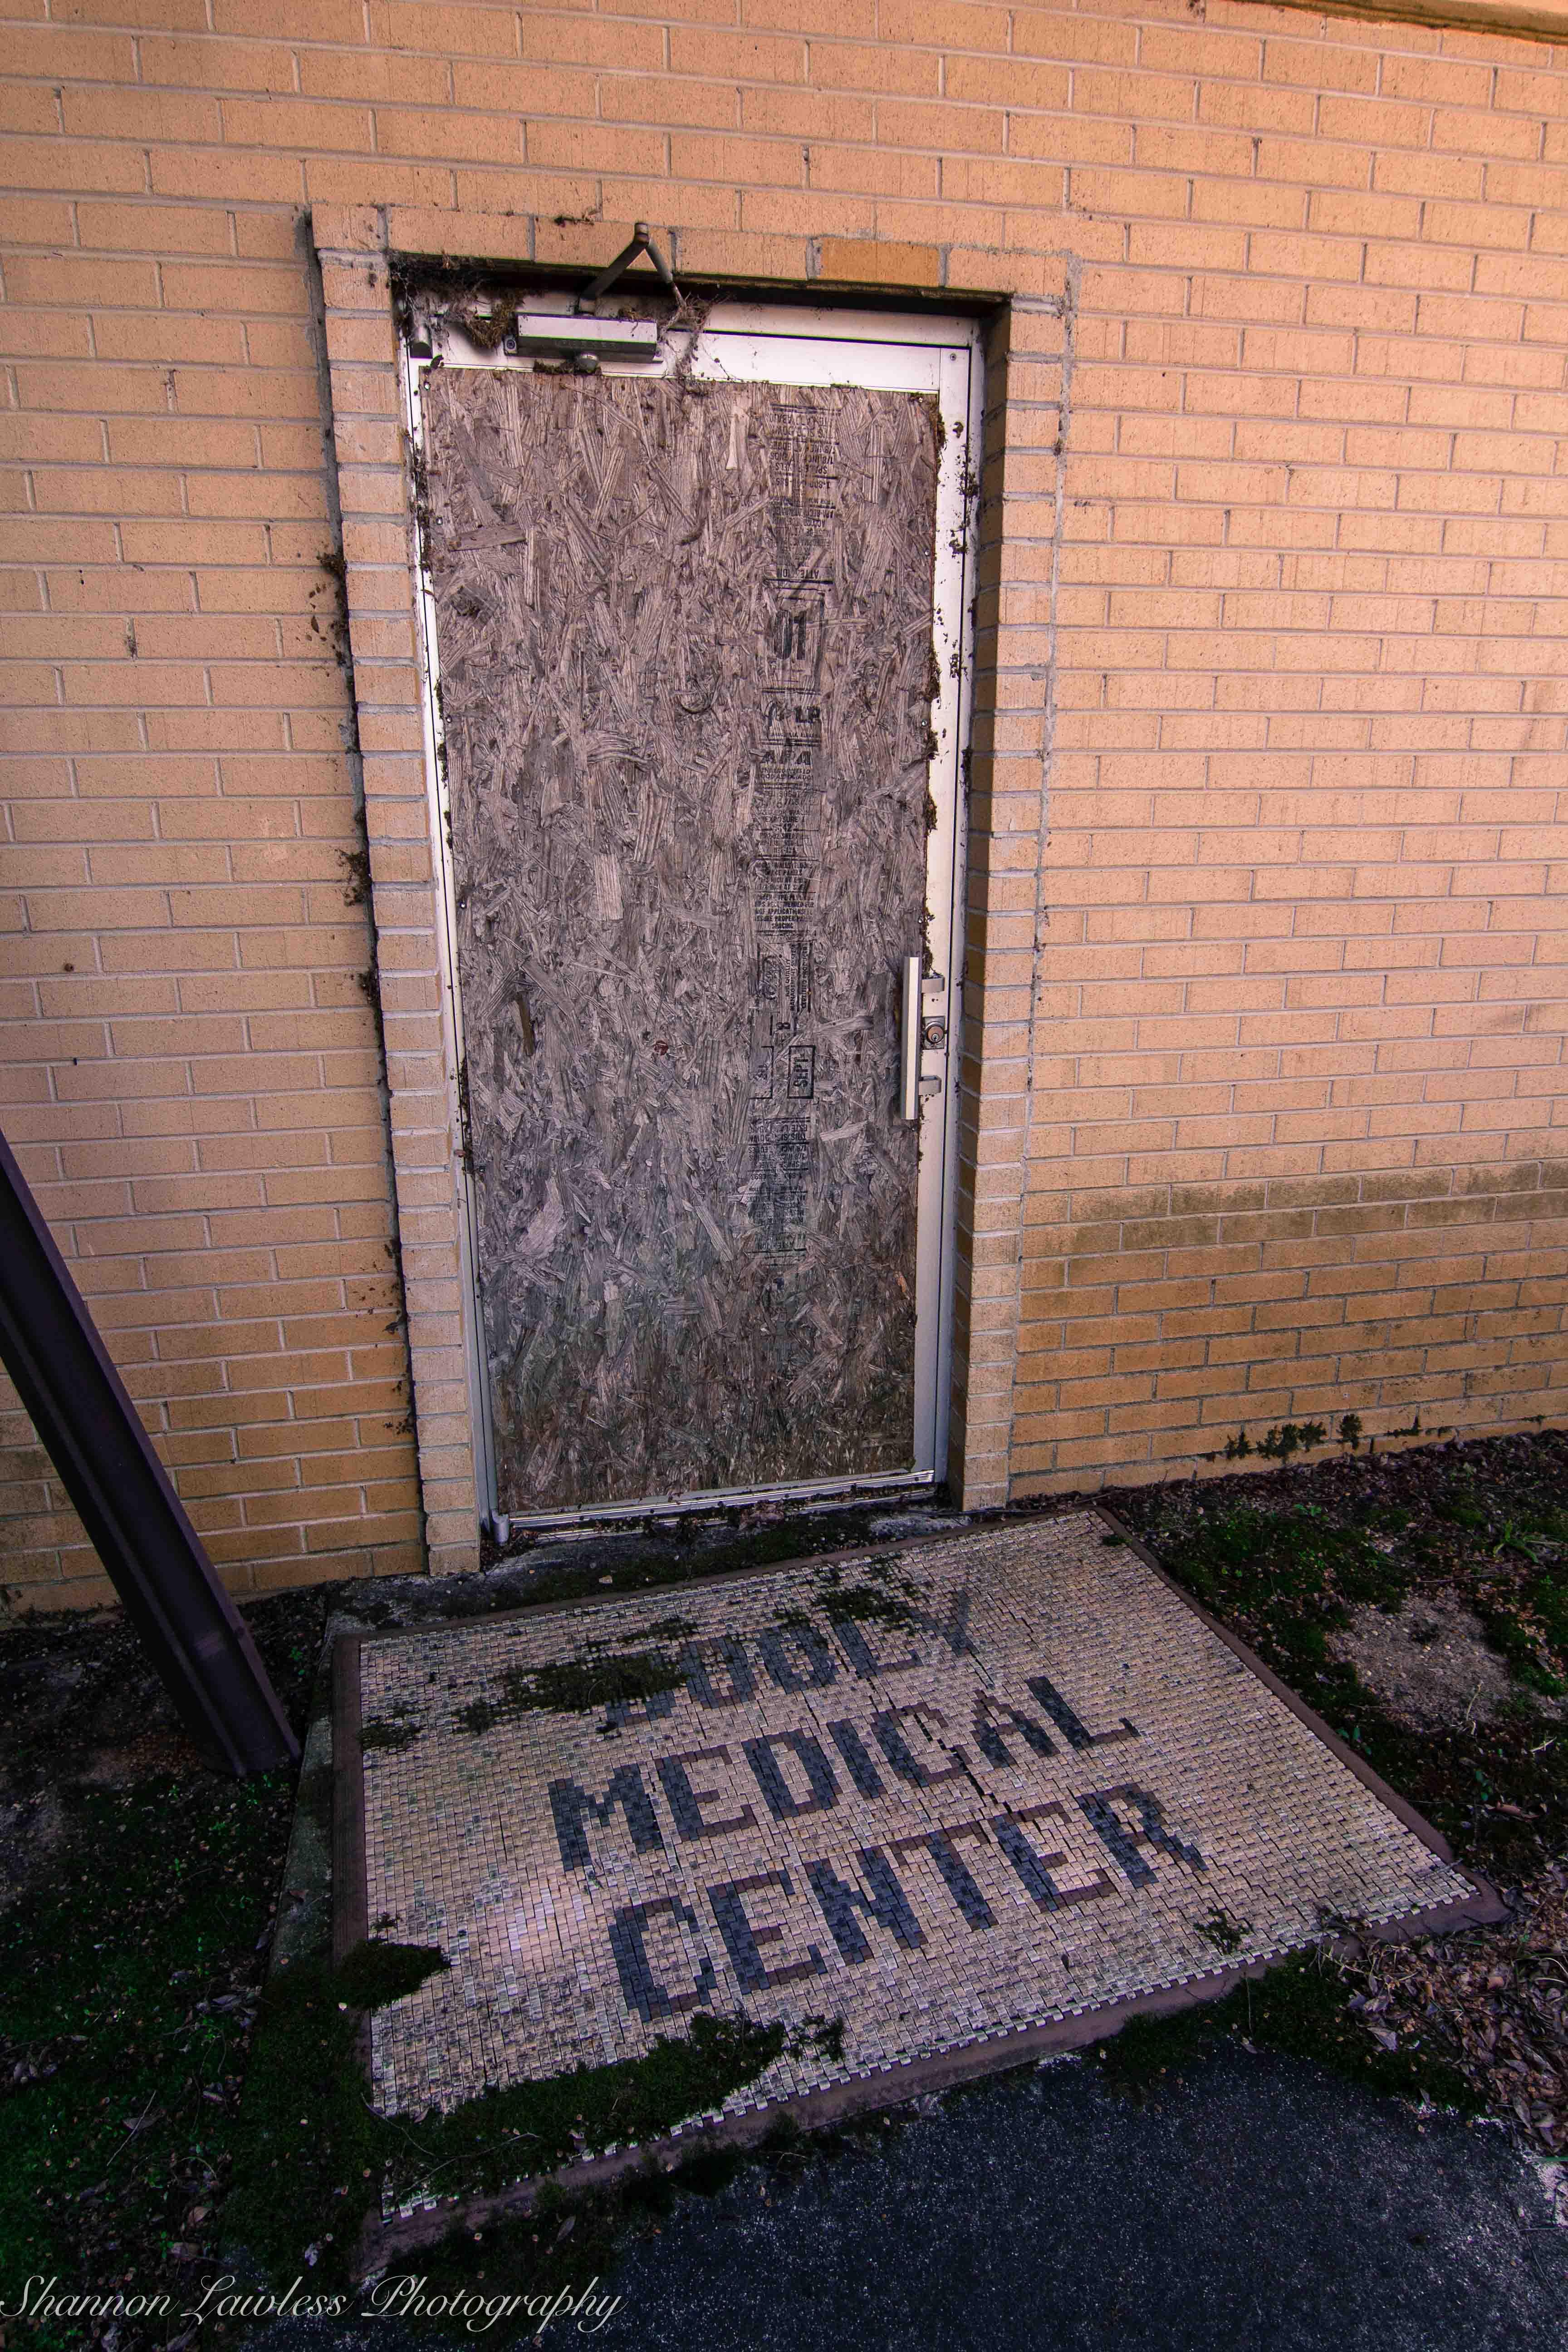 Dooly Medical Center Door Mat